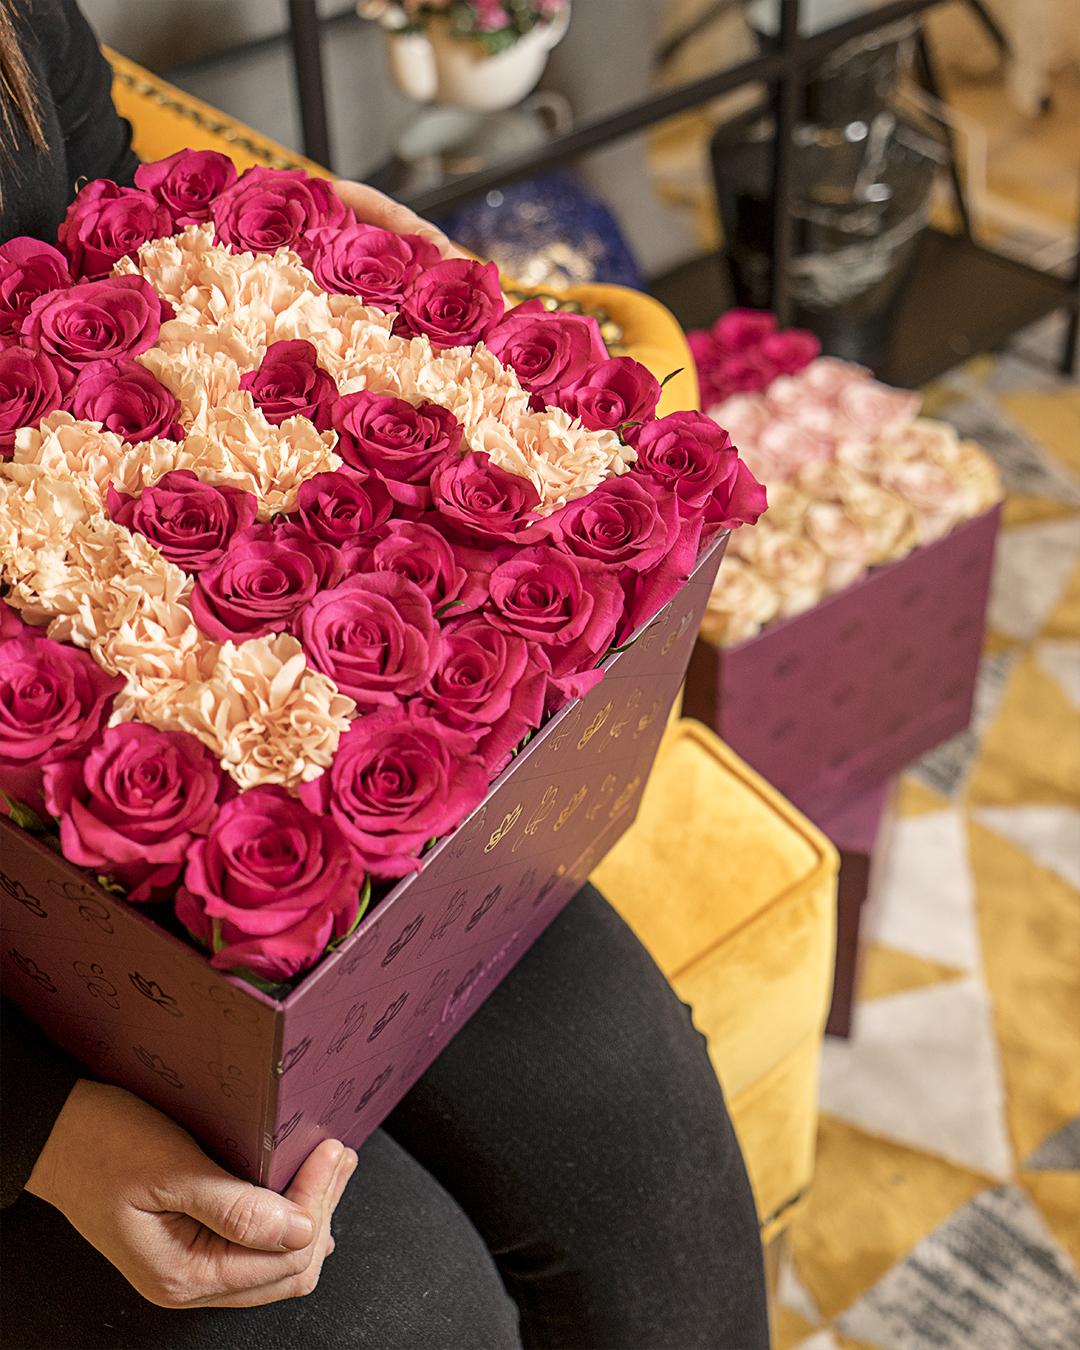 LetterBox زهور مع قاعدة زهور مع قاعدة